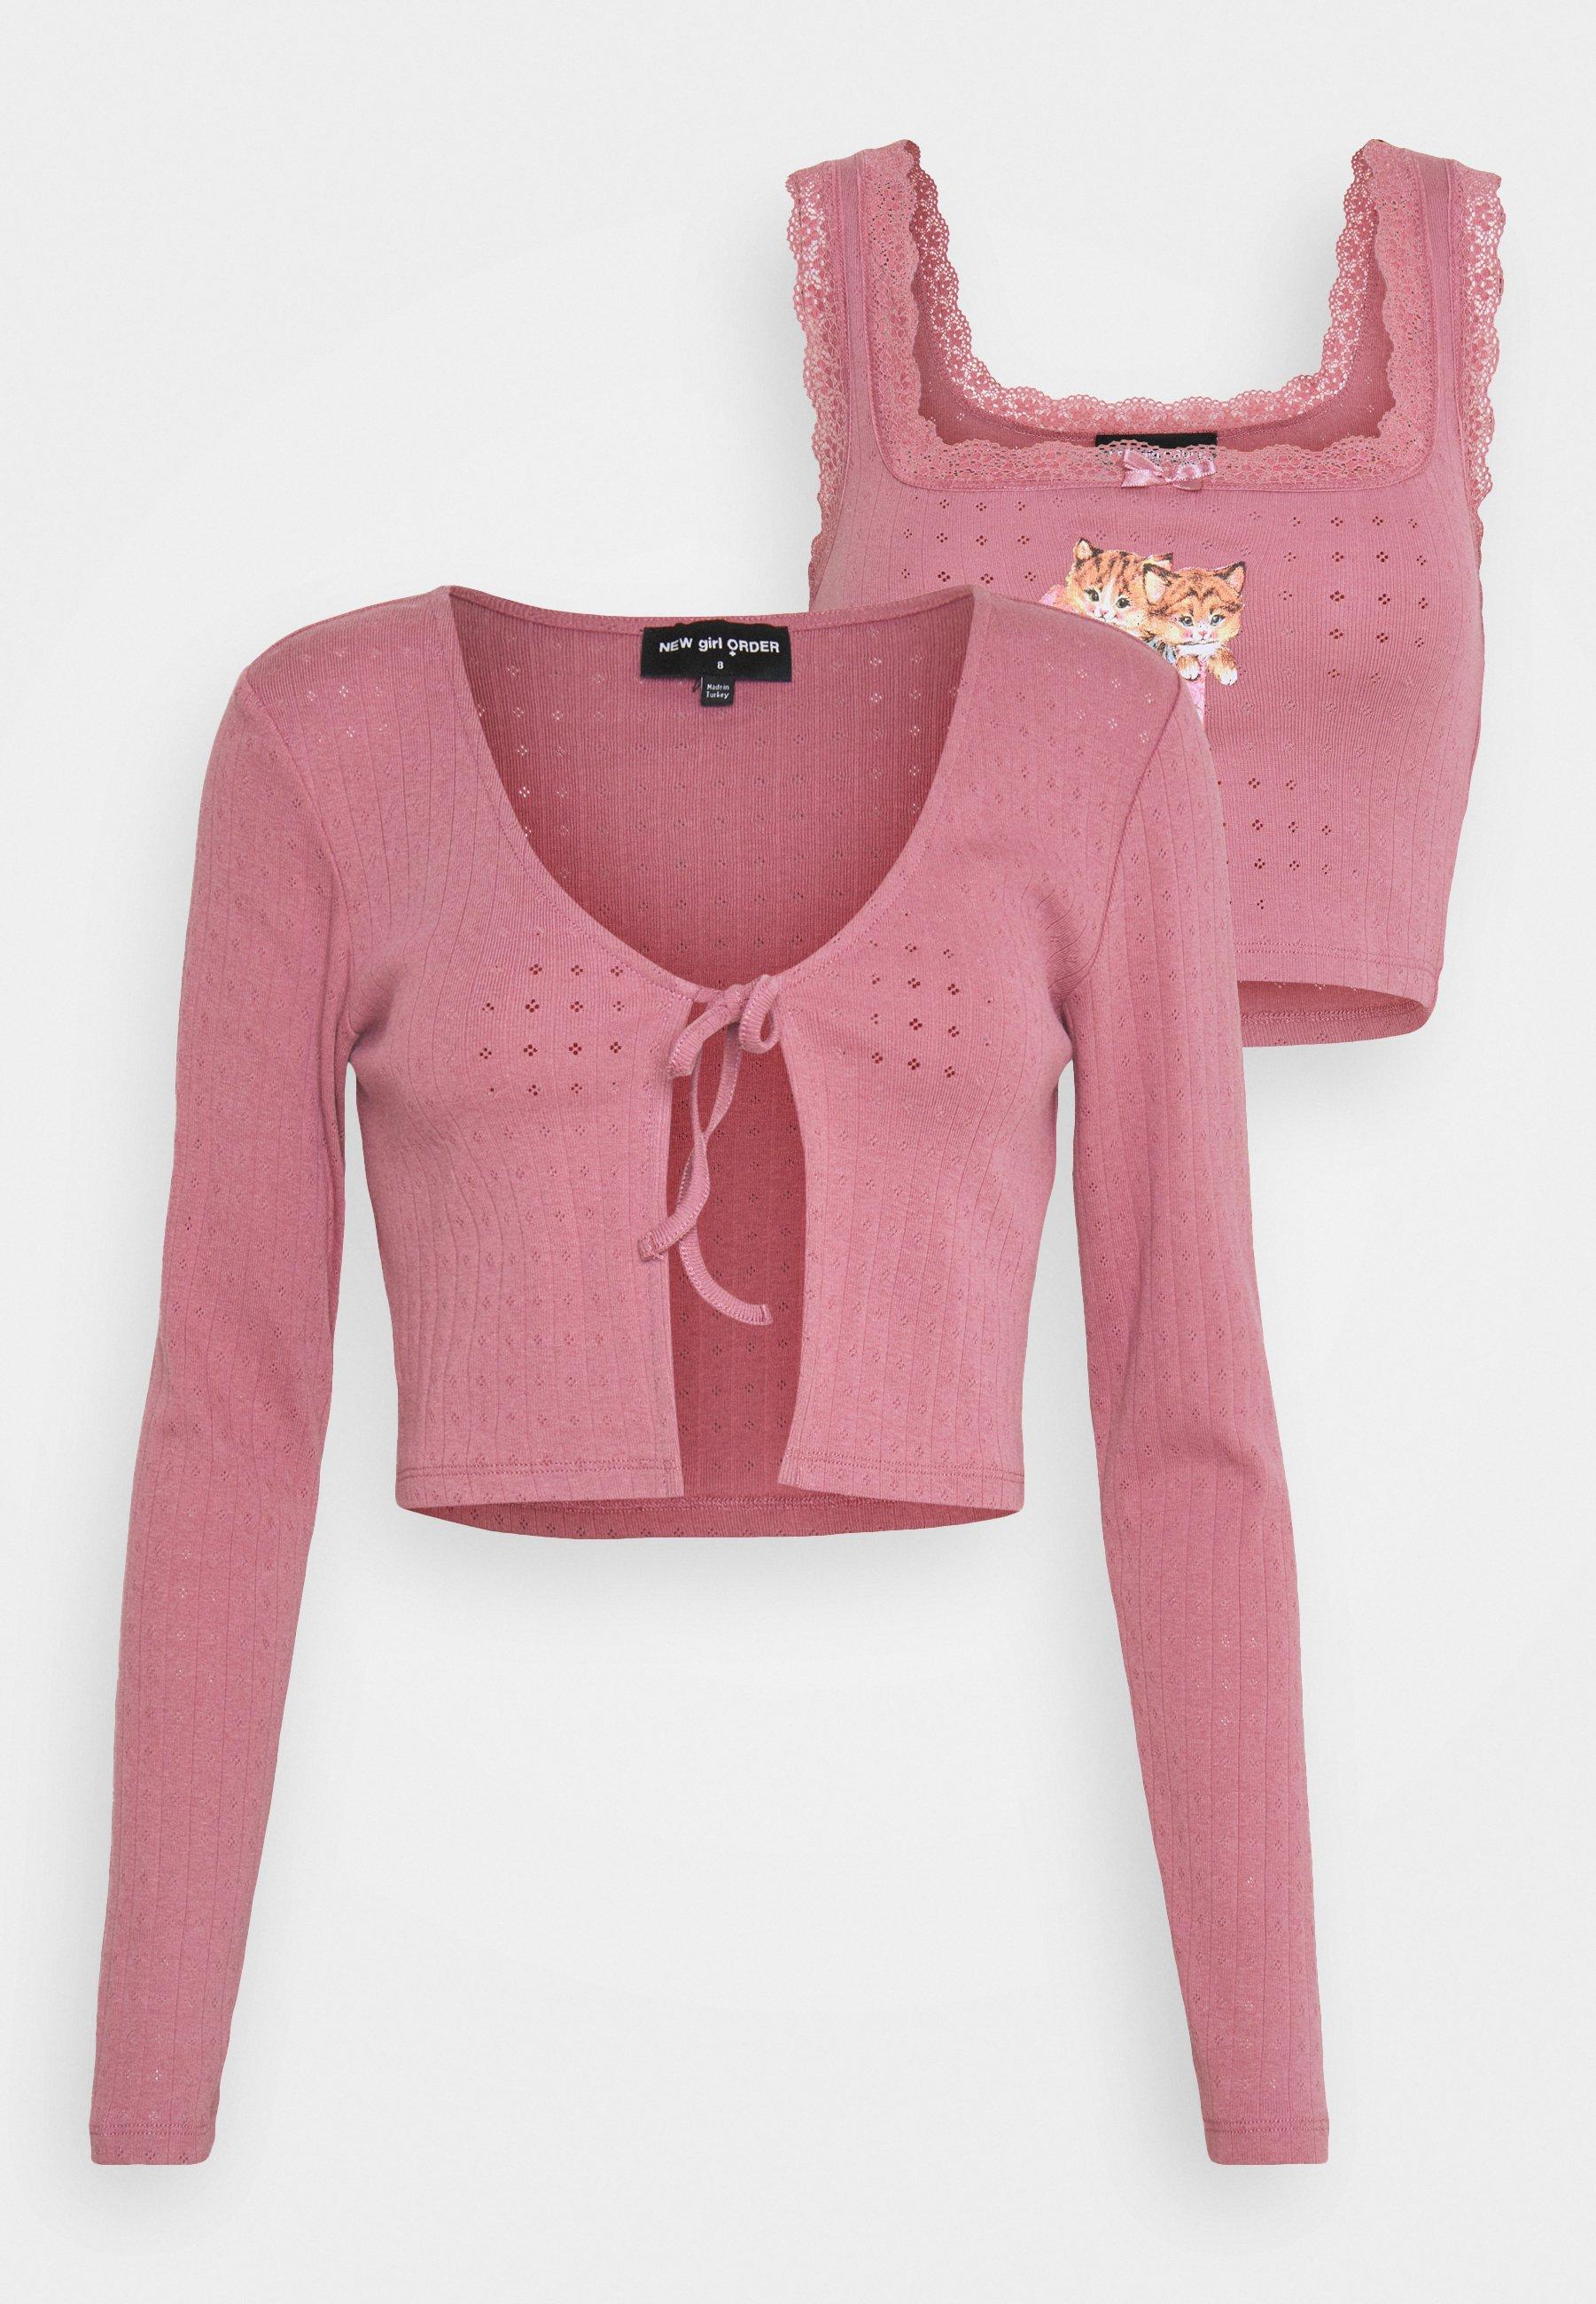 Women KITTEN LACE CAMI & TIE CARDIGAN SET - Long sleeved top